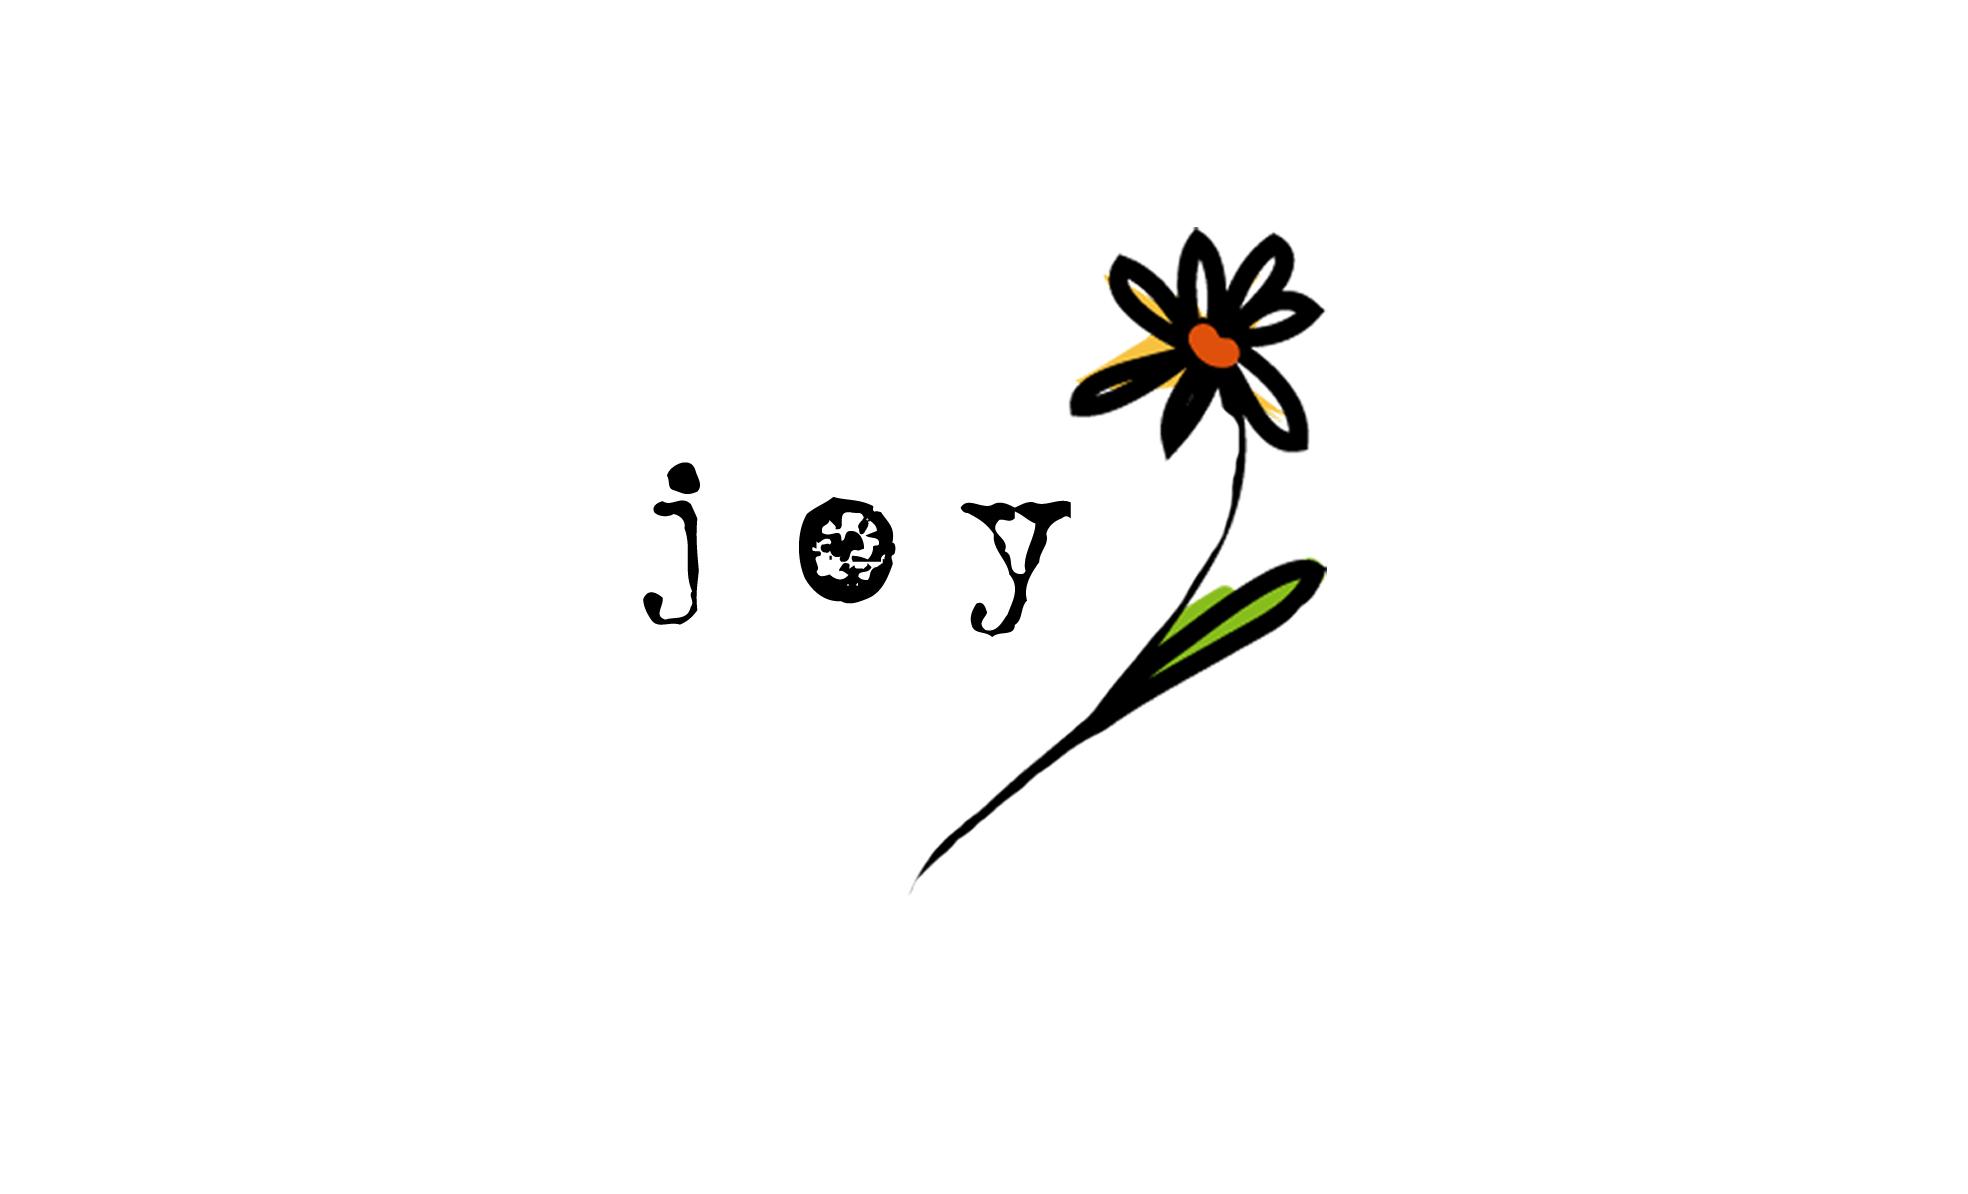 joy-greeting-card-company3